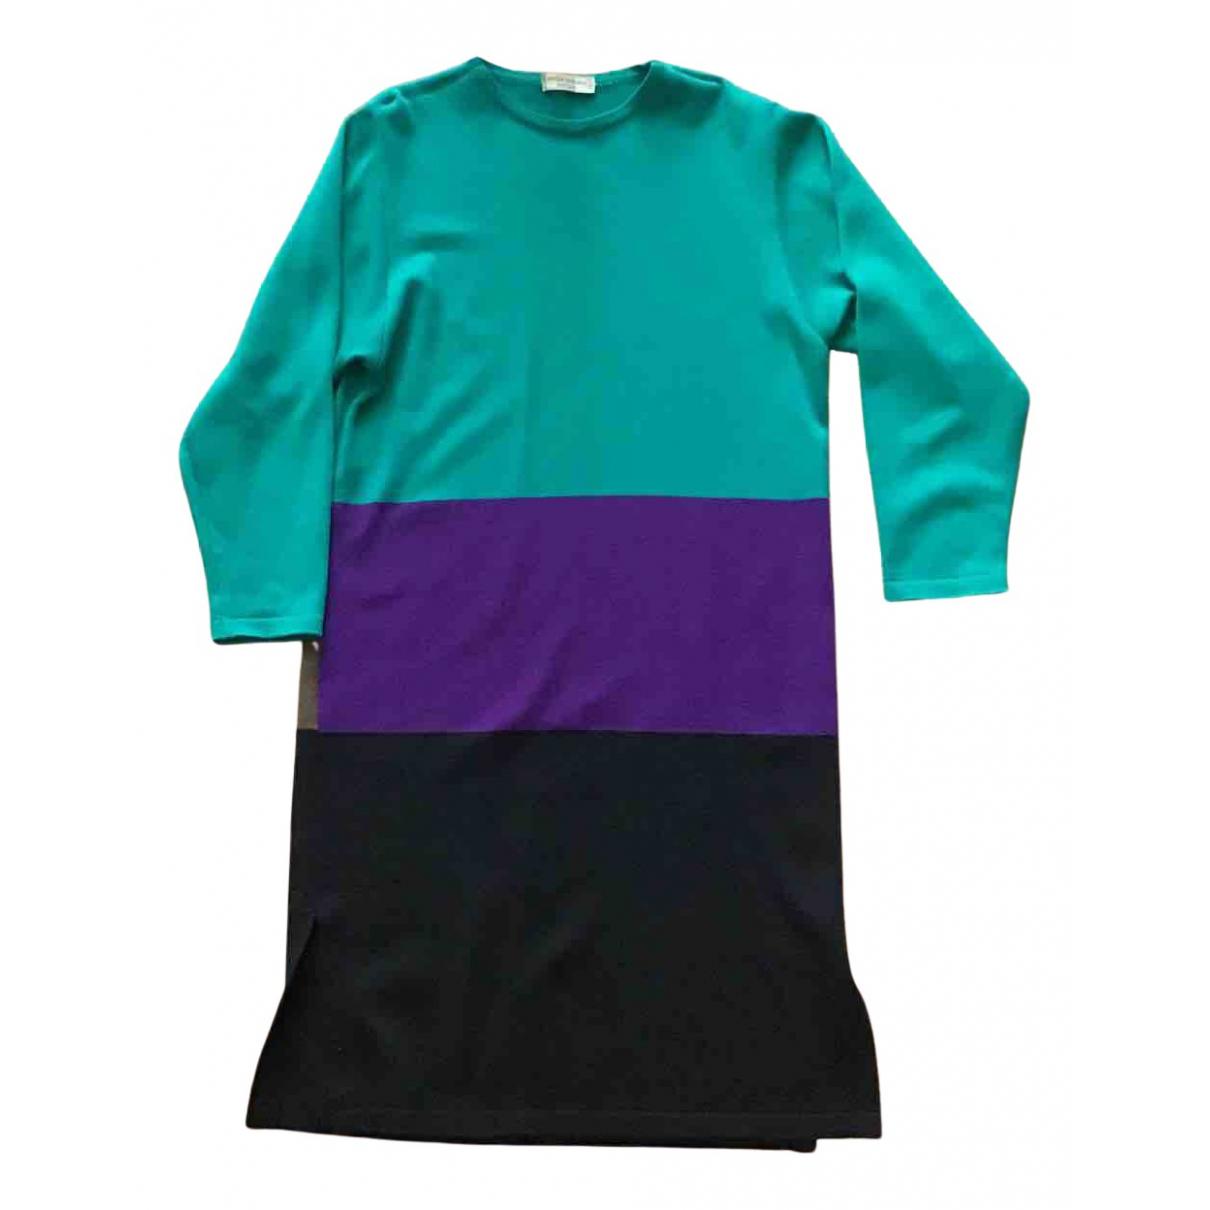 Vestido midi de Lana Mila Schon Concept